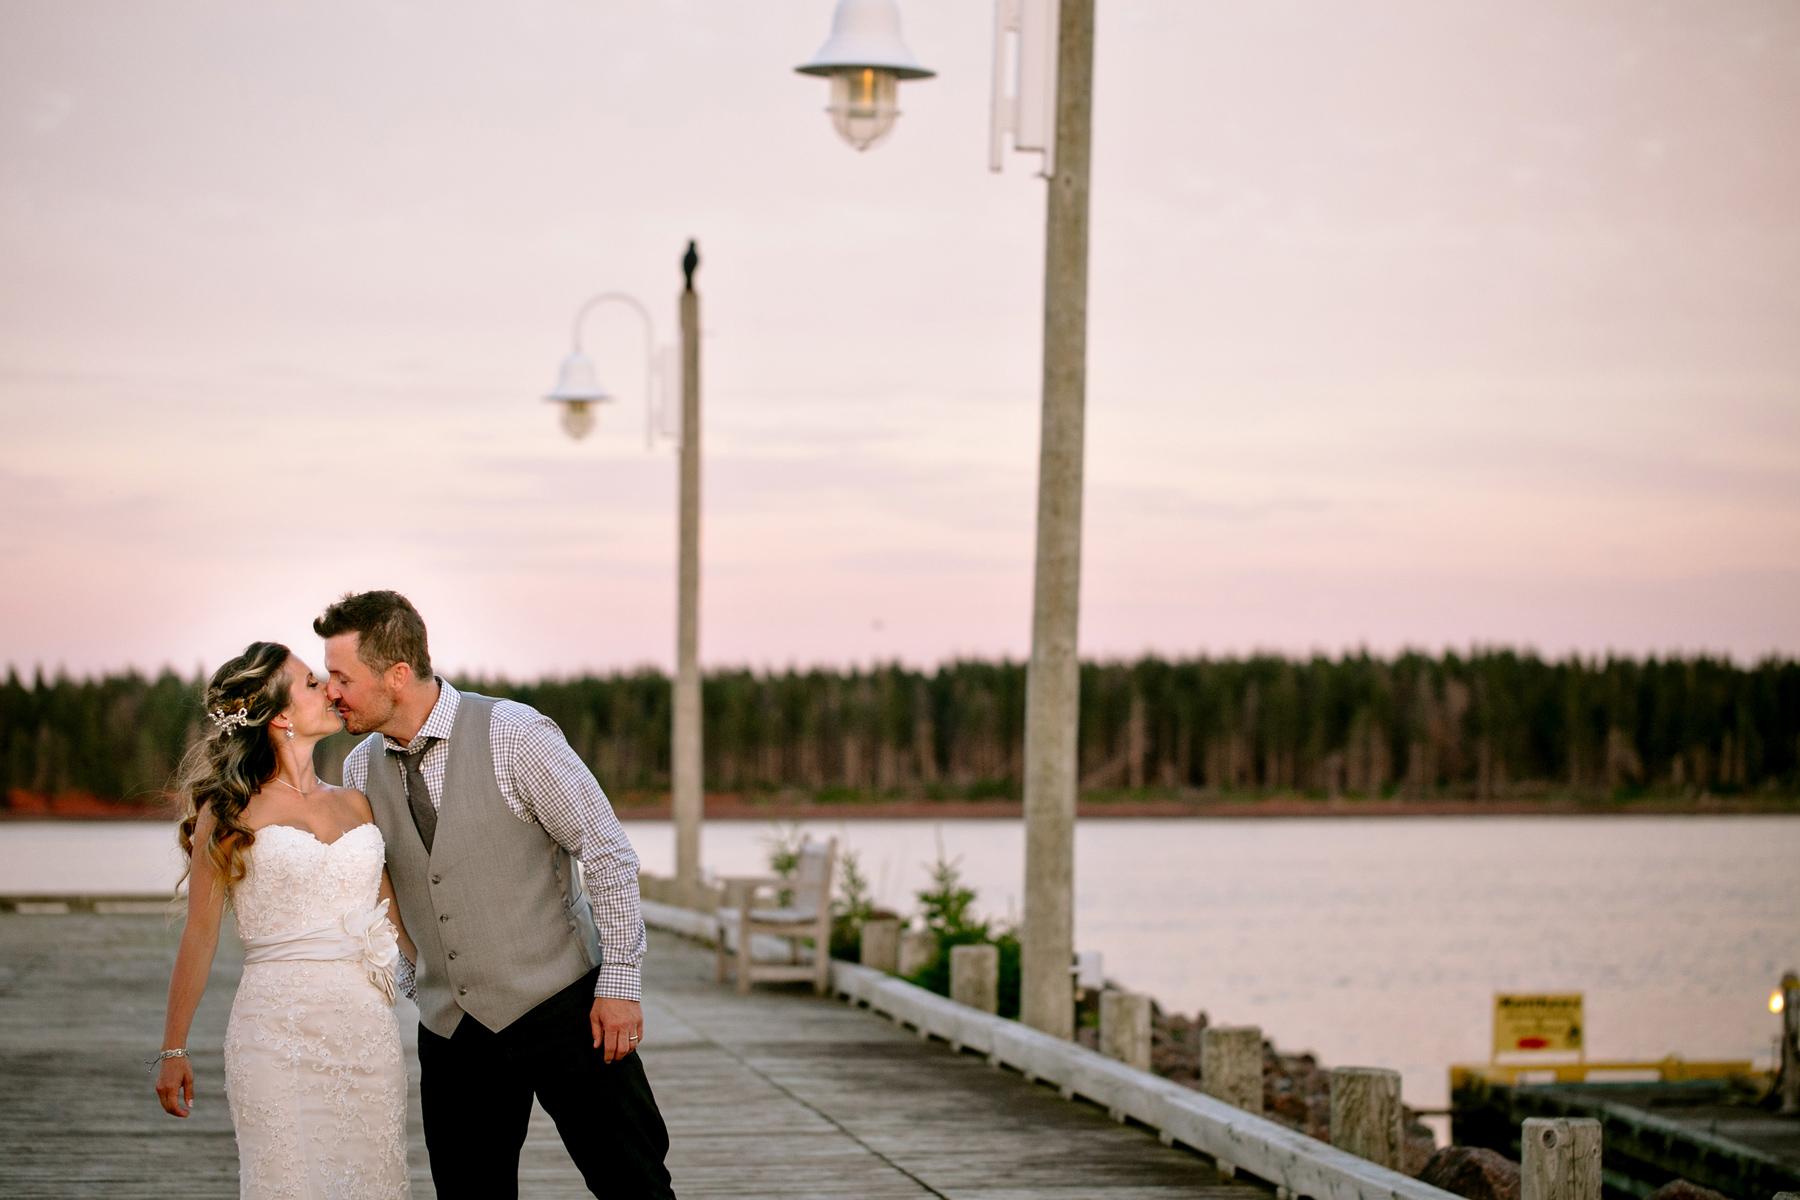 057-awesome-pei-wedding-photography-kandisebrown